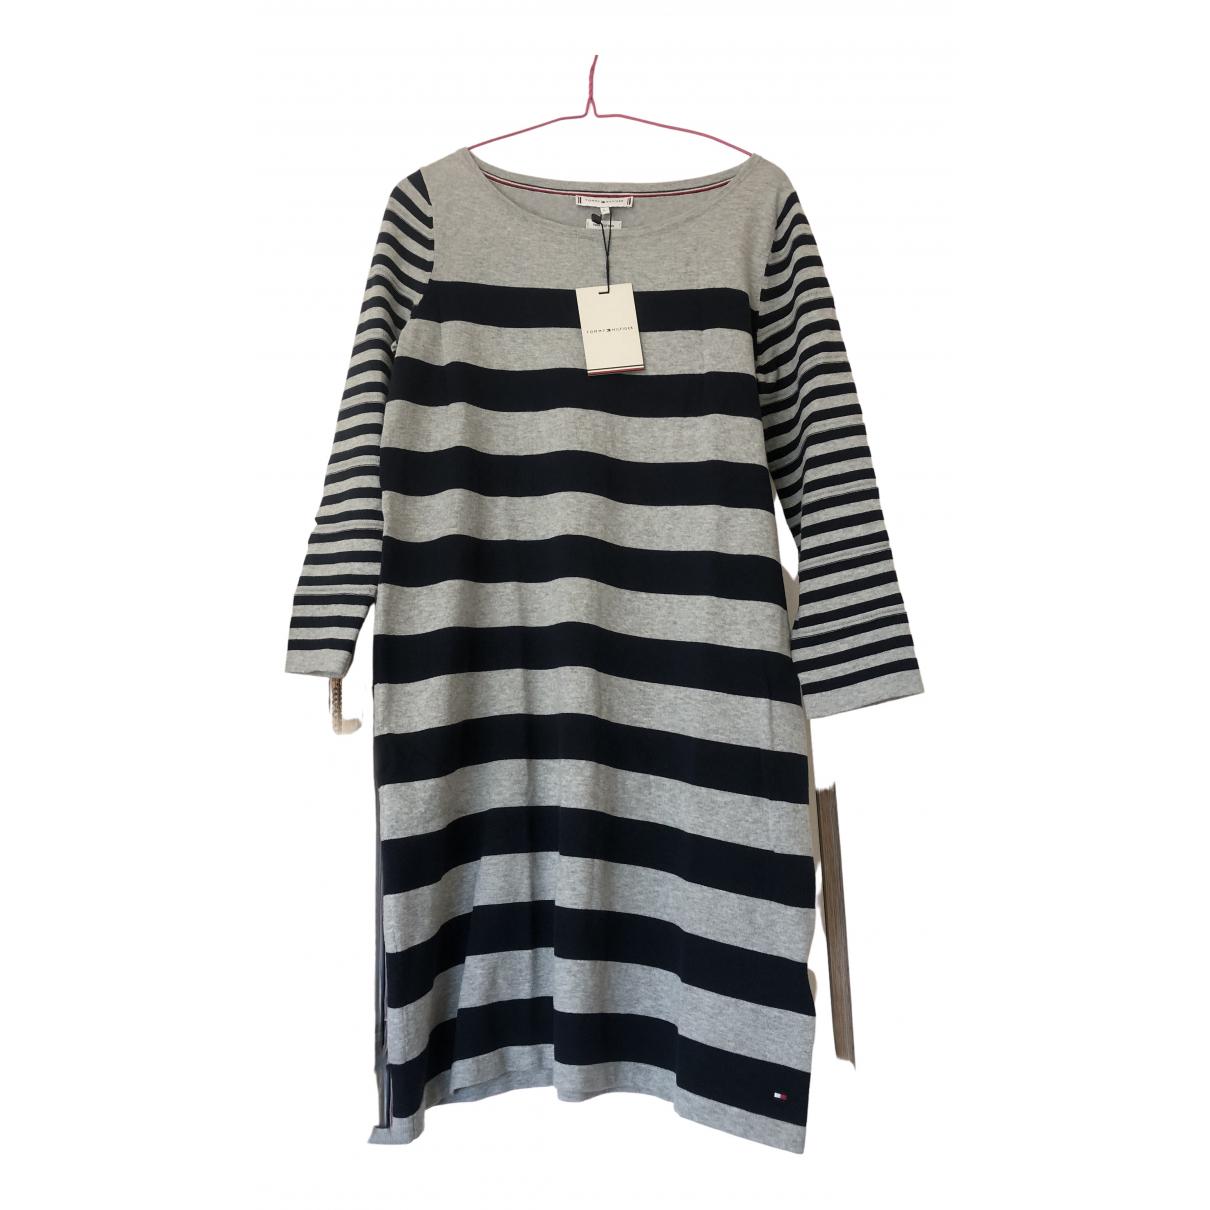 Tommy Hilfiger N Grey Cotton dress for Women S International